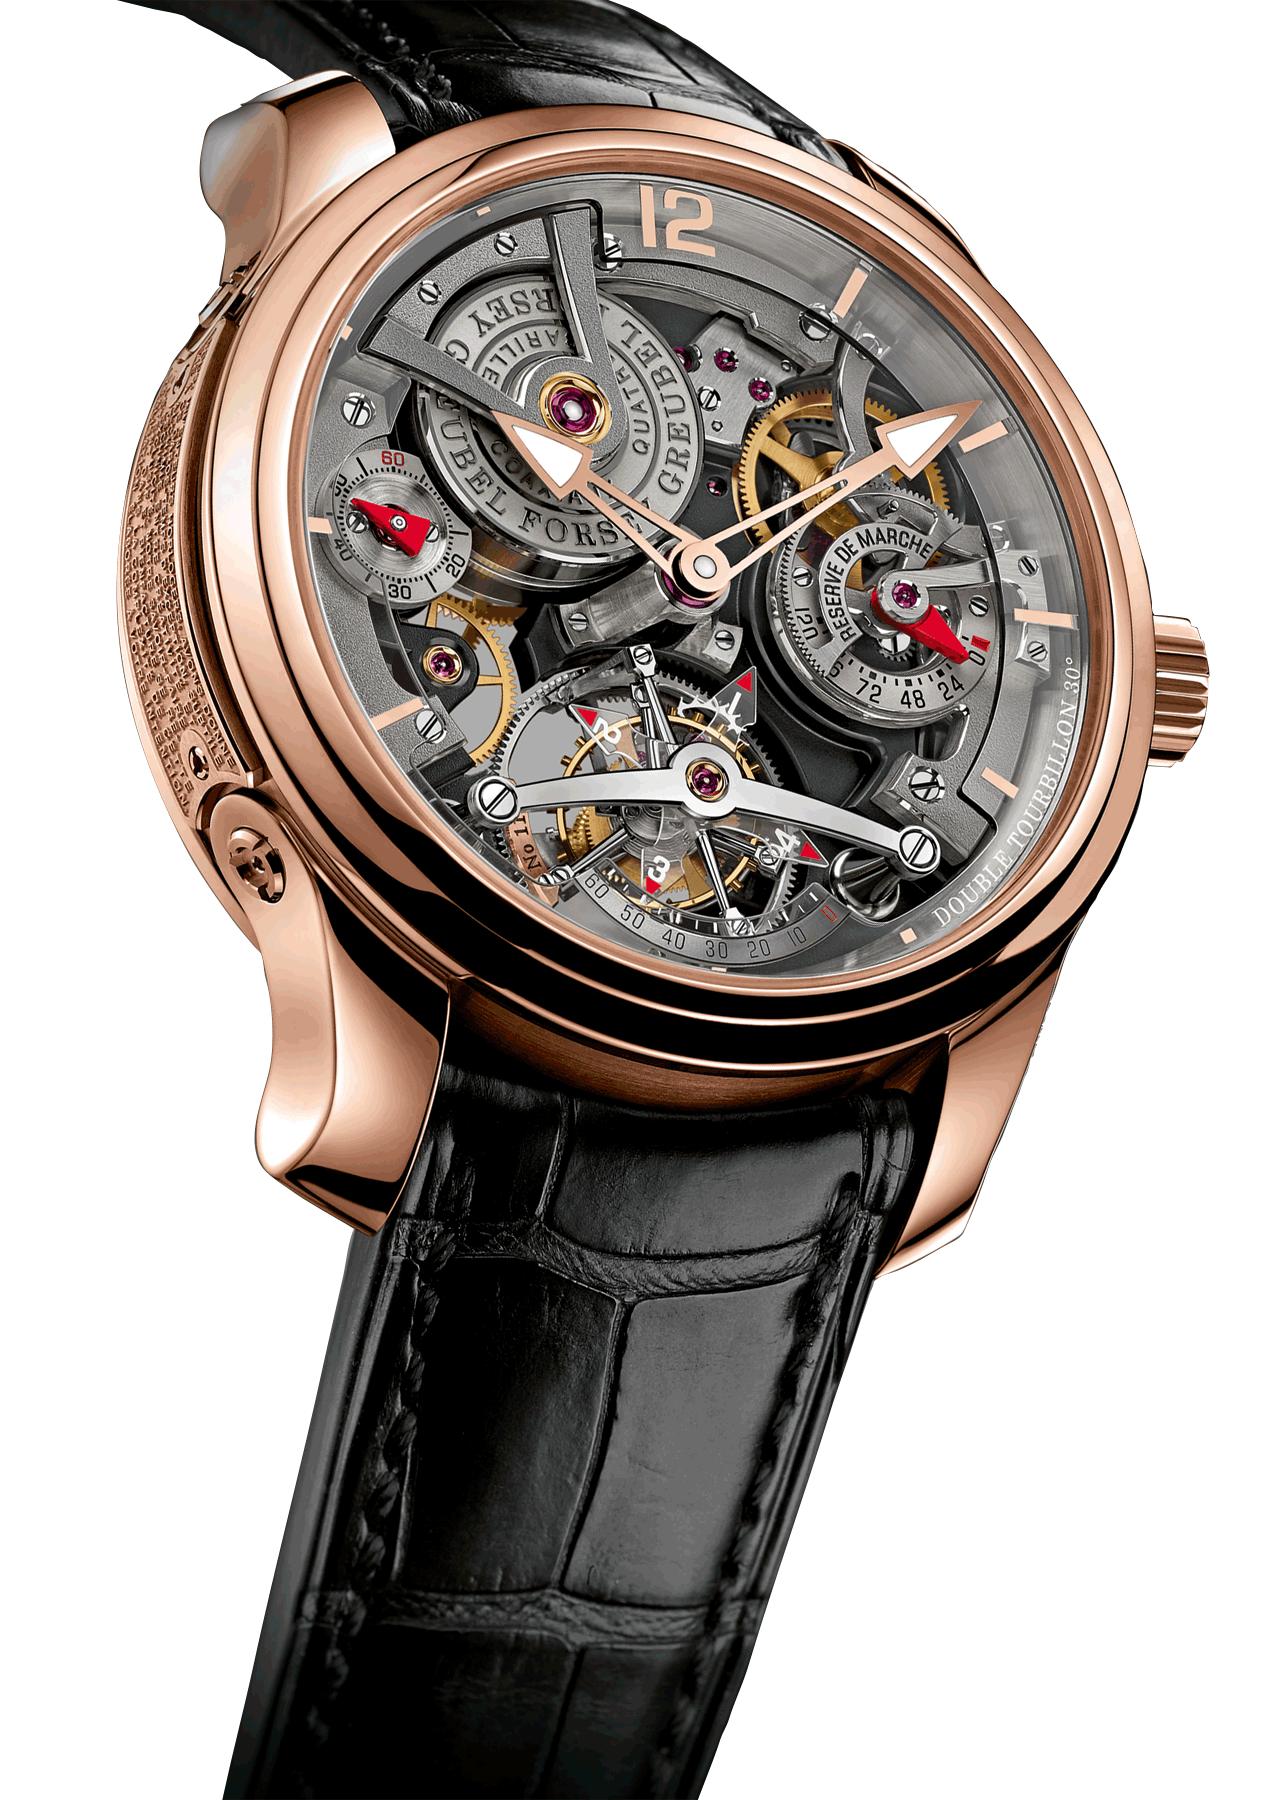 c42fcafd735 Greubel Forsey DUPLO TURBILHÃO 30º TECHNIQUE - GF02S OR5   Boutique dos  Relógios